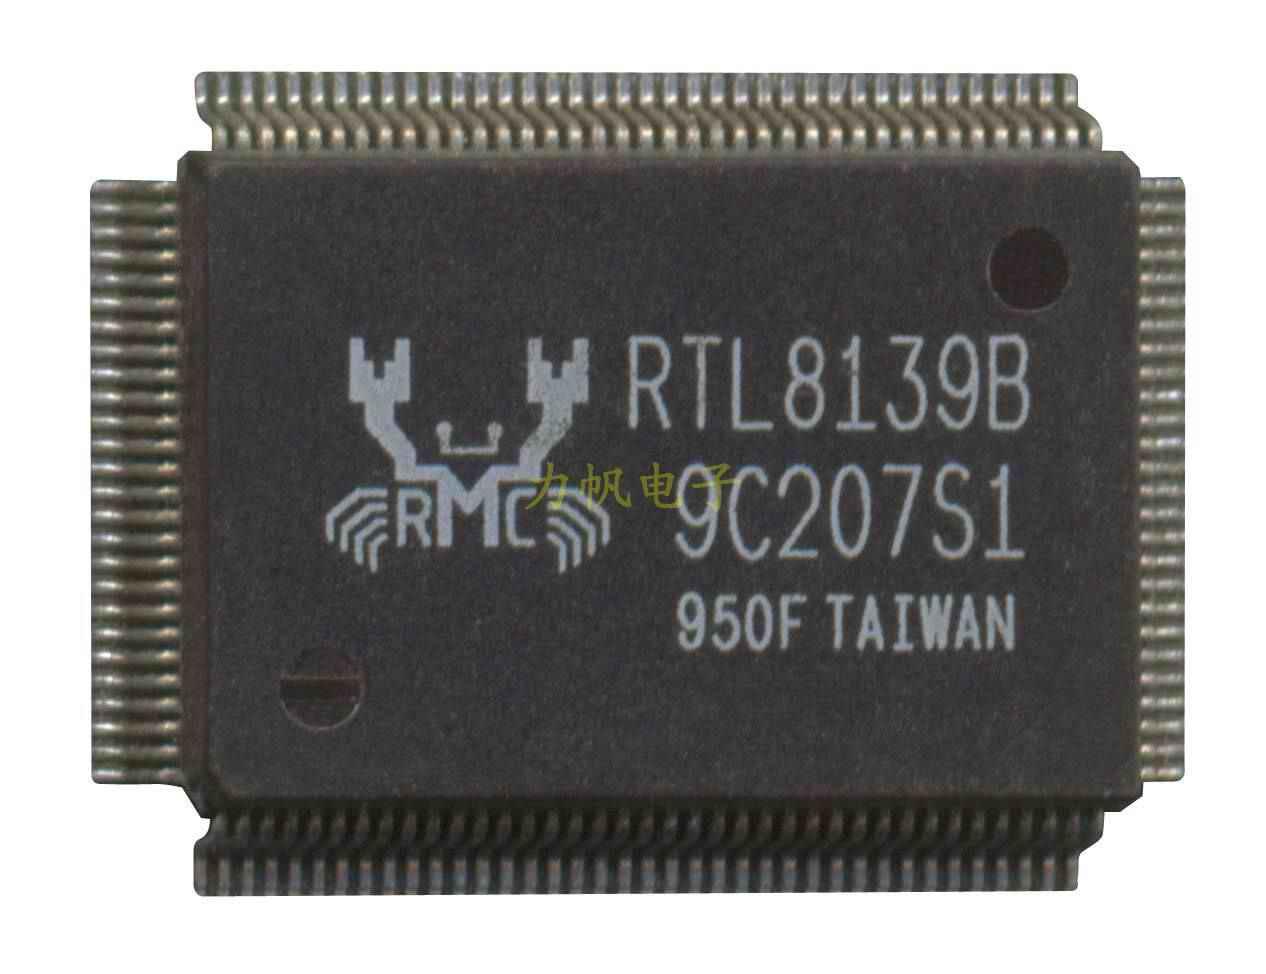 rtl8139b